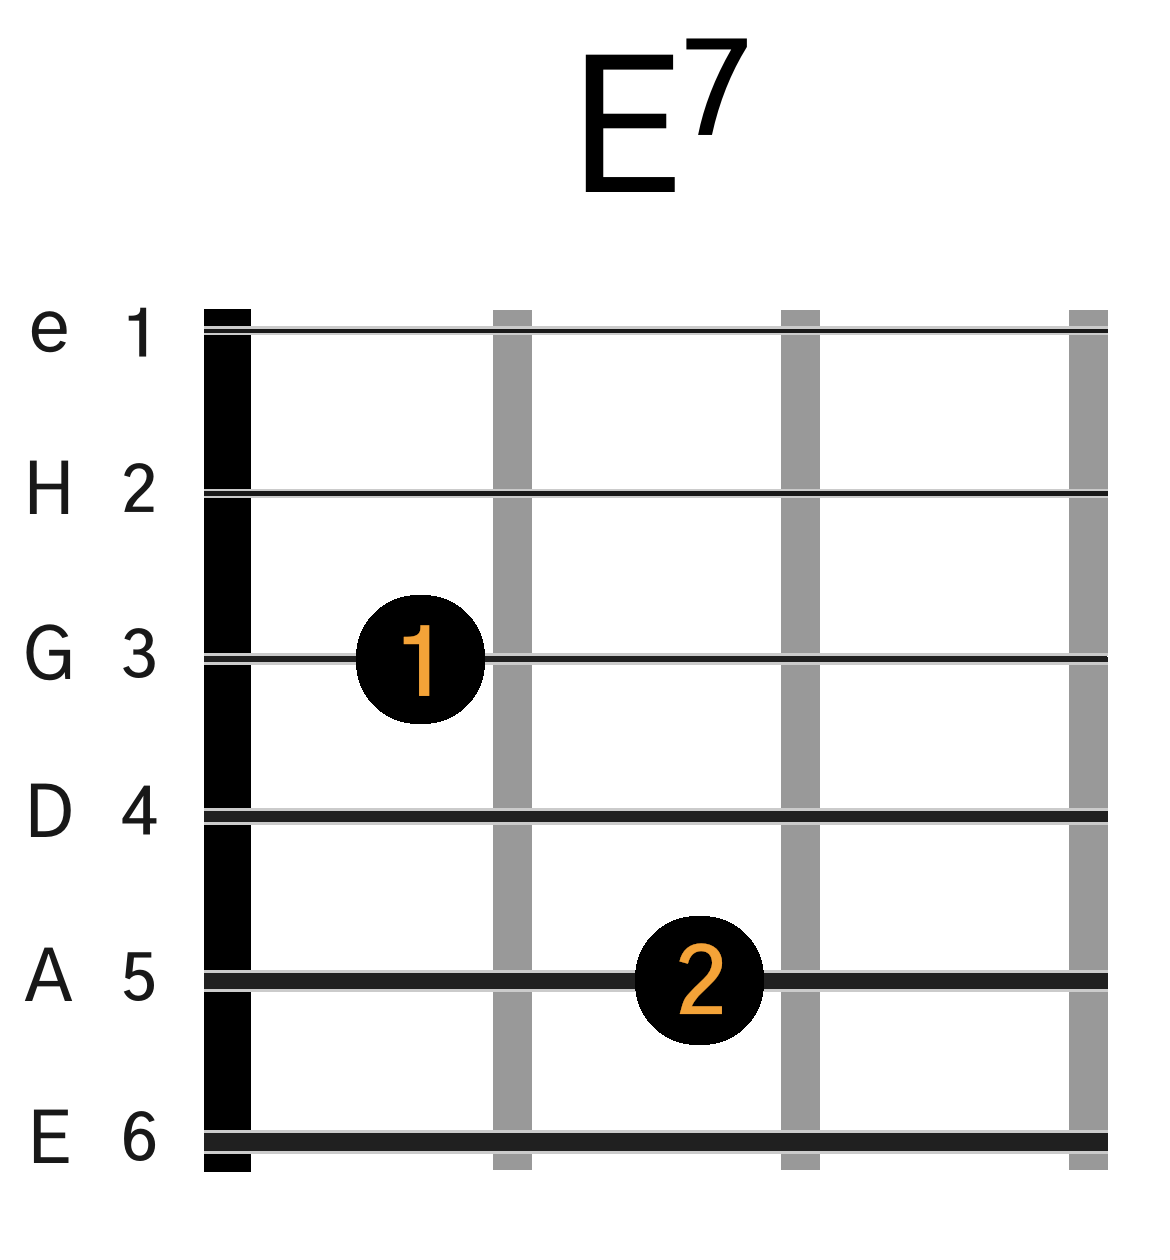 E7 guitar akkord grafik